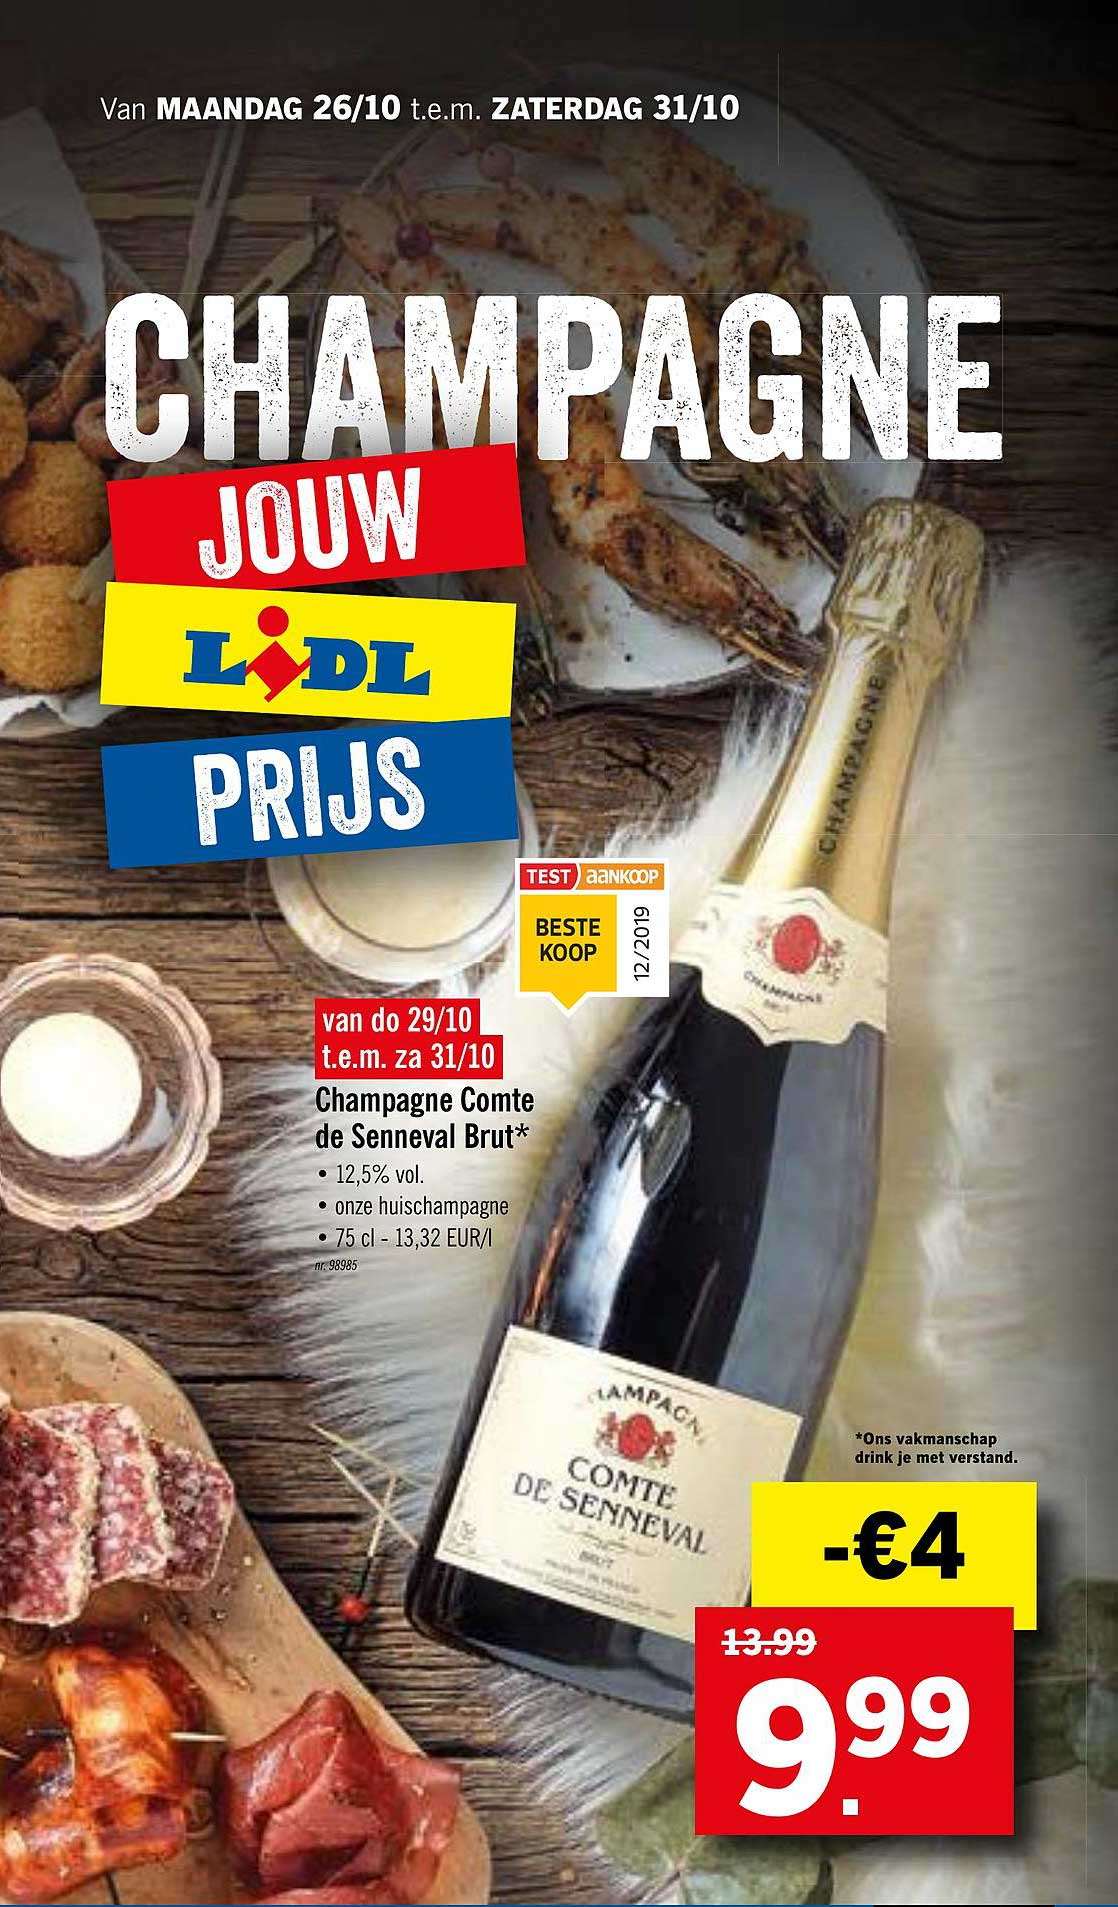 Lidl Champagne Comte De Senneval Brut*